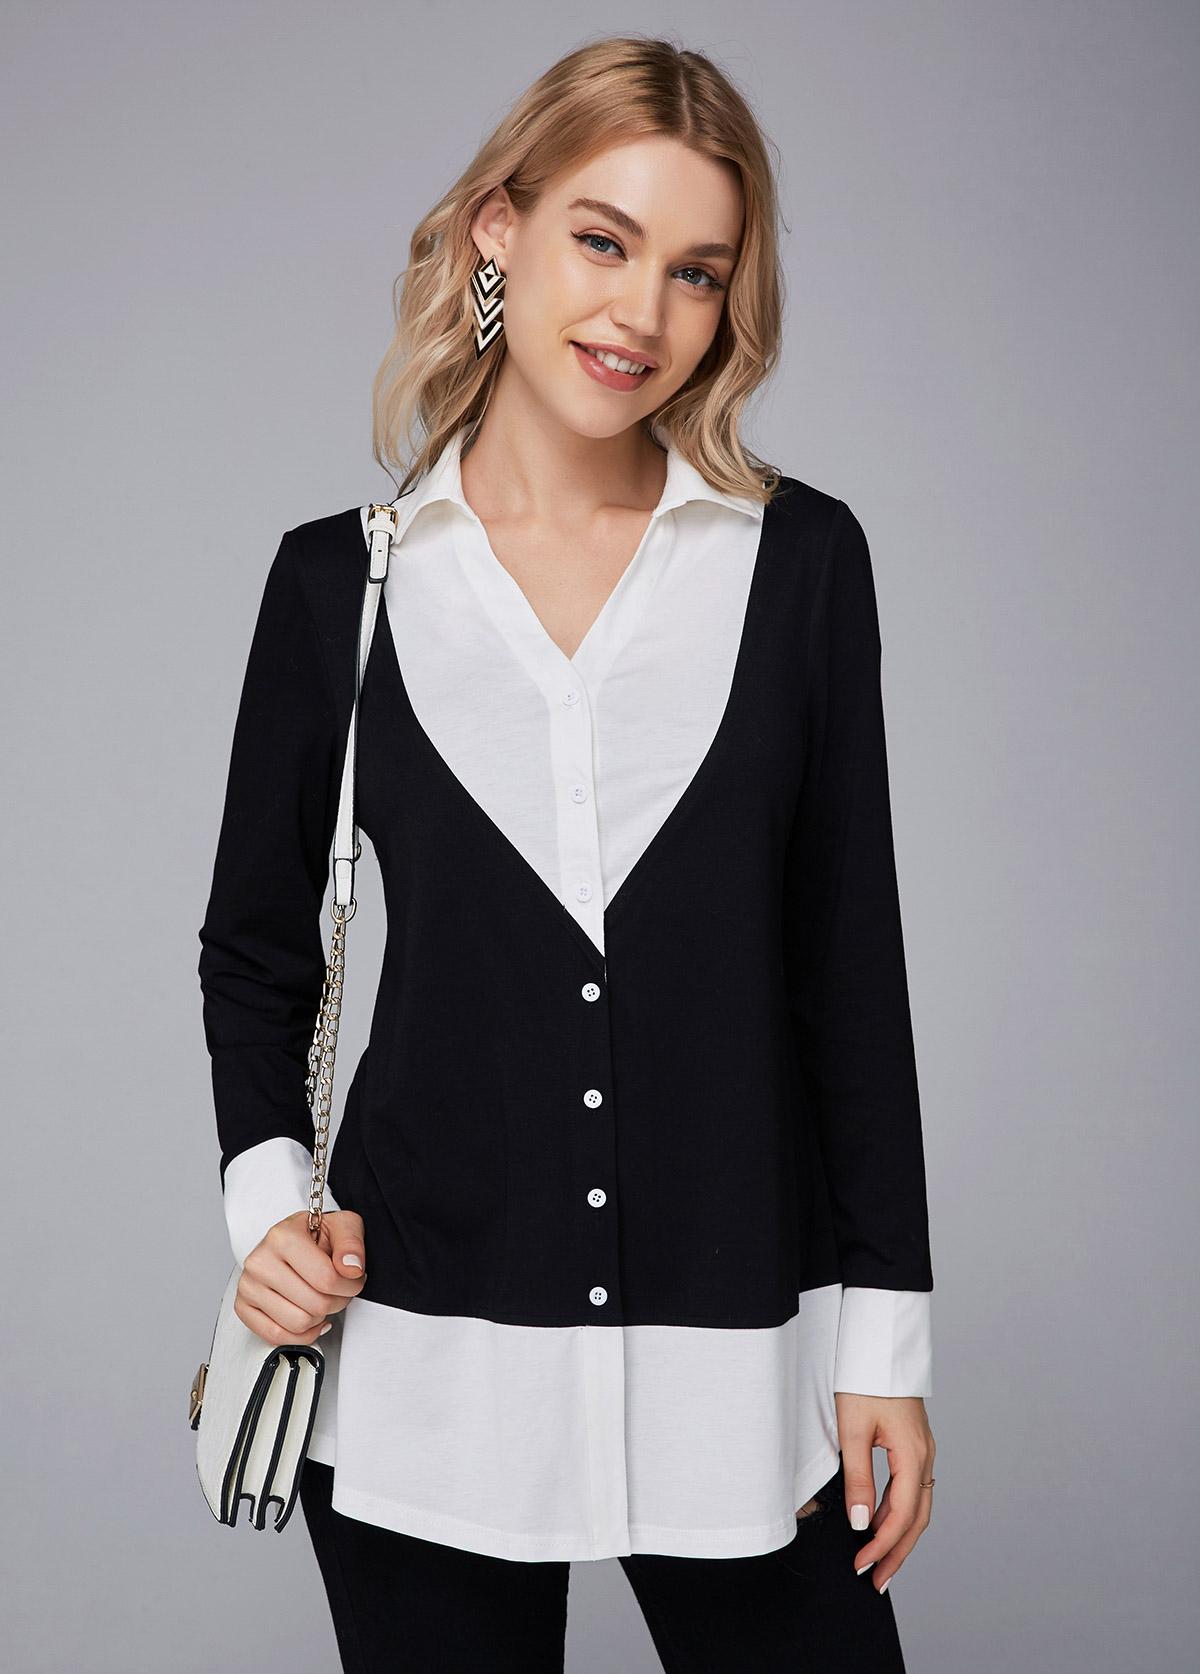 ROTITA Button Up Turndown Collar Contrast T Shirt